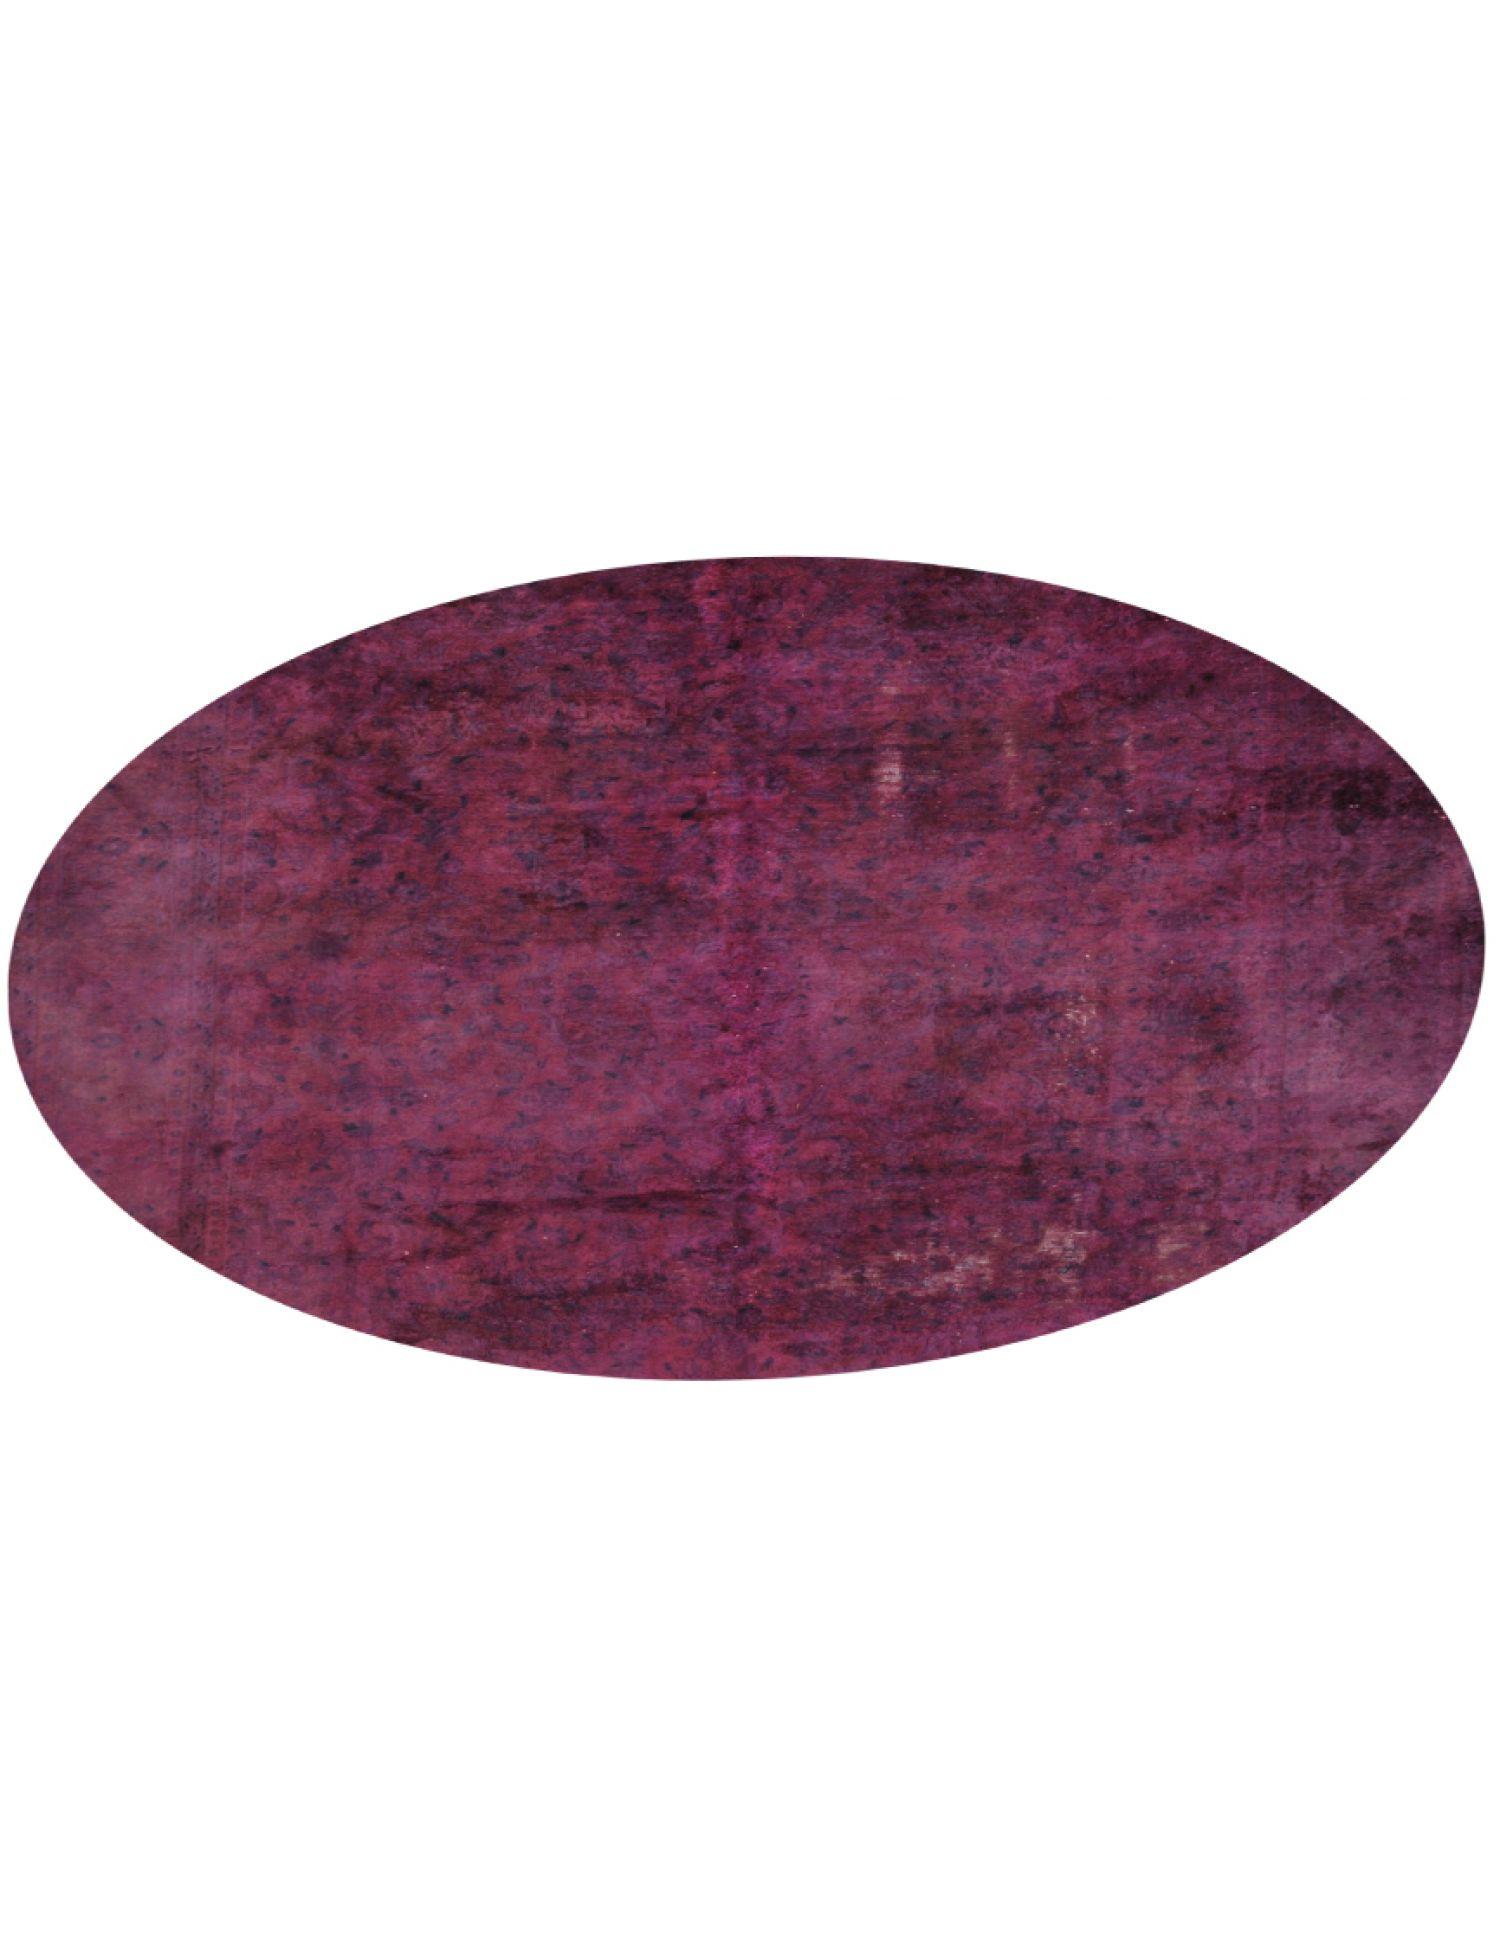 Tappeto Vintage  viola <br/>274 x 274 cm